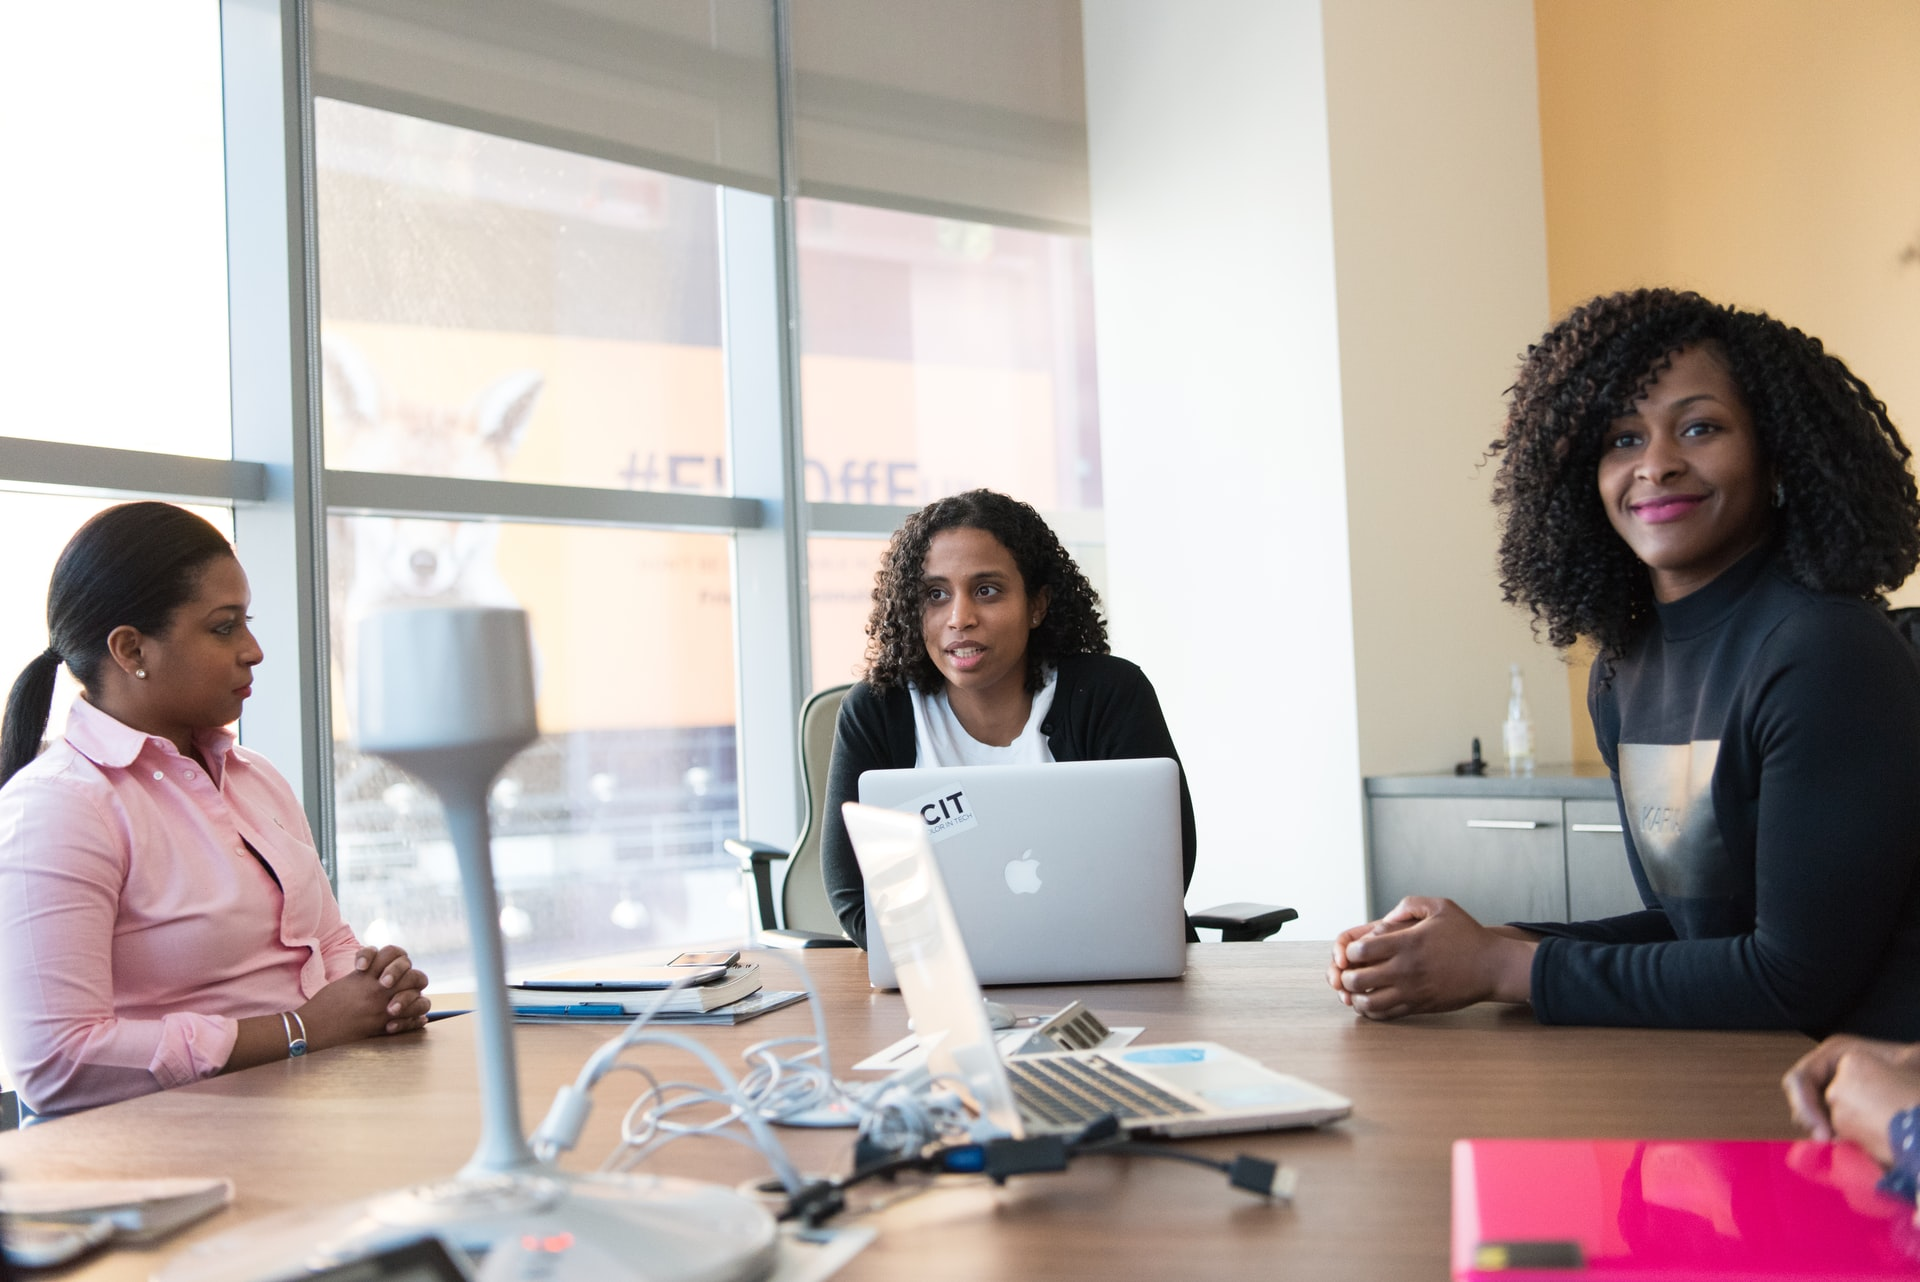 How should an employer handle a discrimination case?